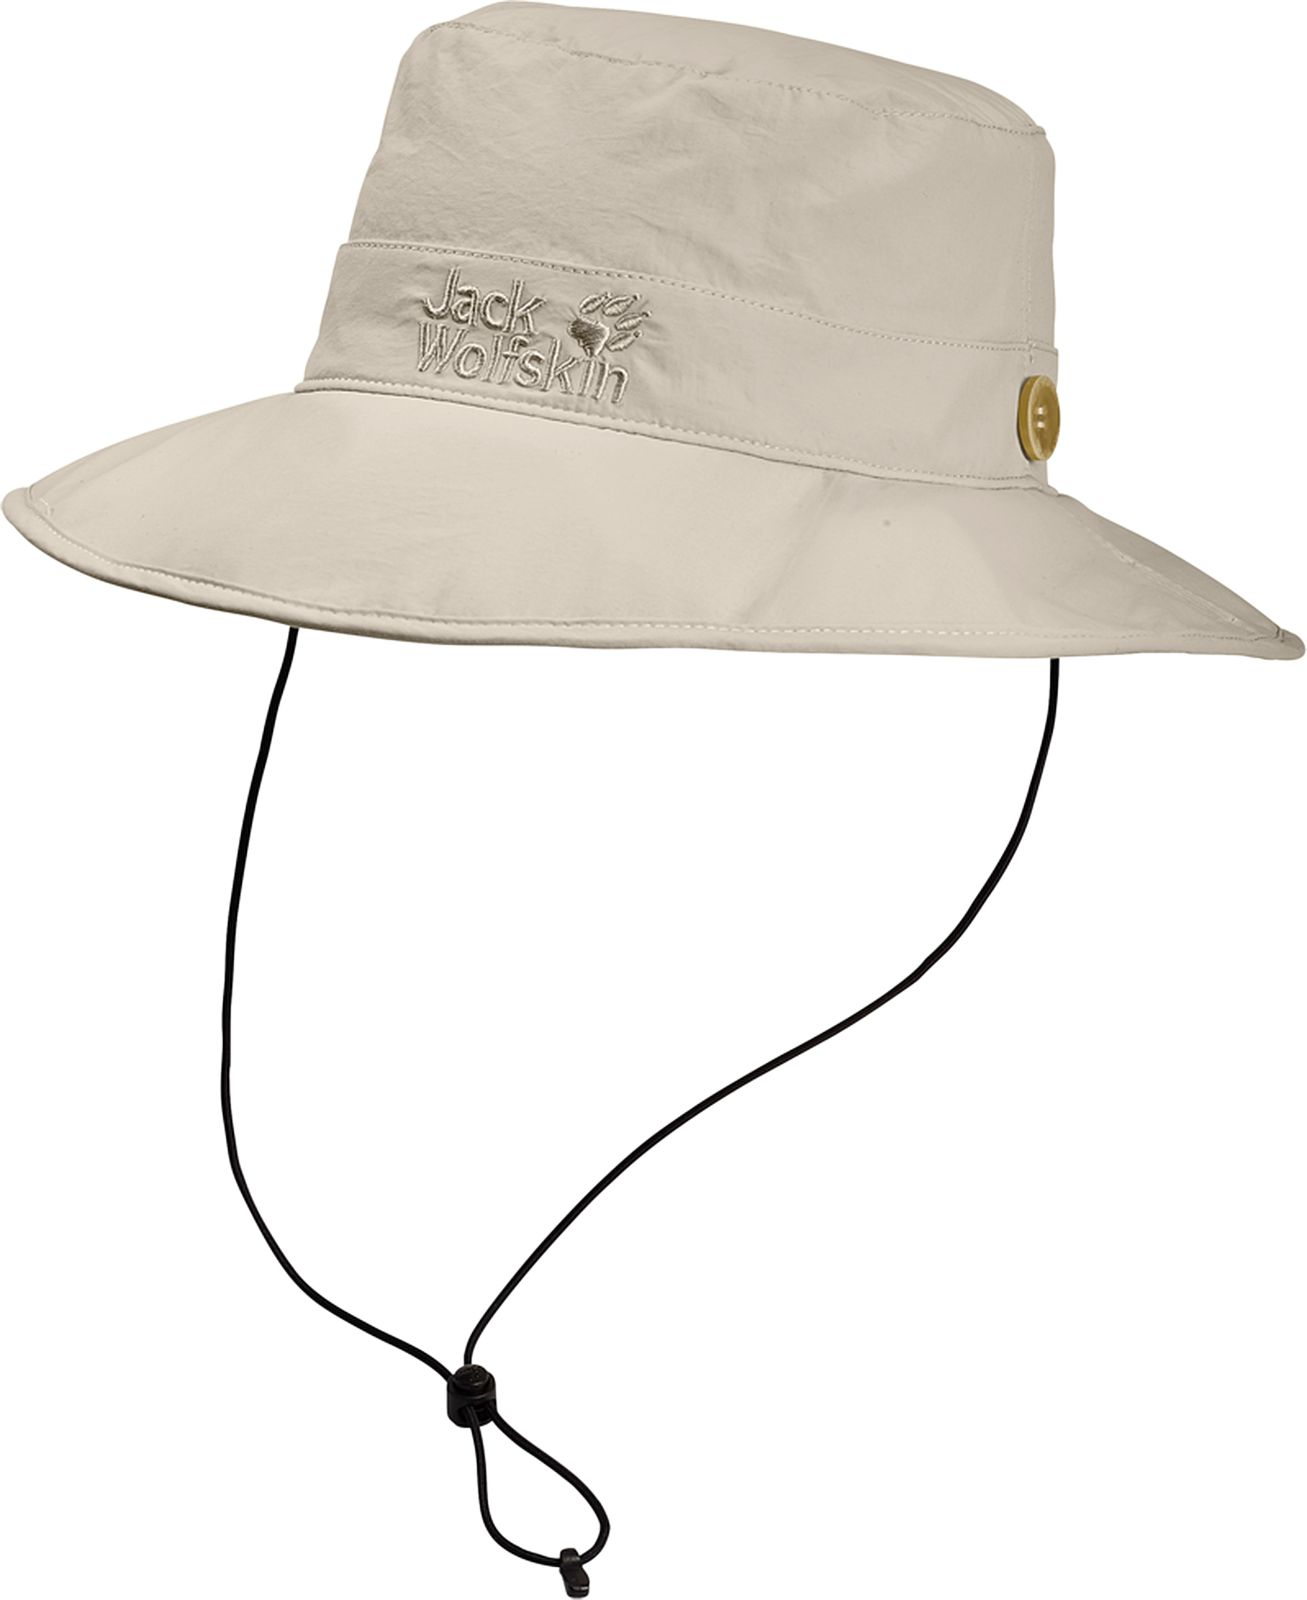 Панама Jack Wolfskin Supplex Mesh Hat, цвет: молочный. 1902042-5505. Размер M (54/57) чехлы для телефонов jack wolfskin чехол gadget pouch m